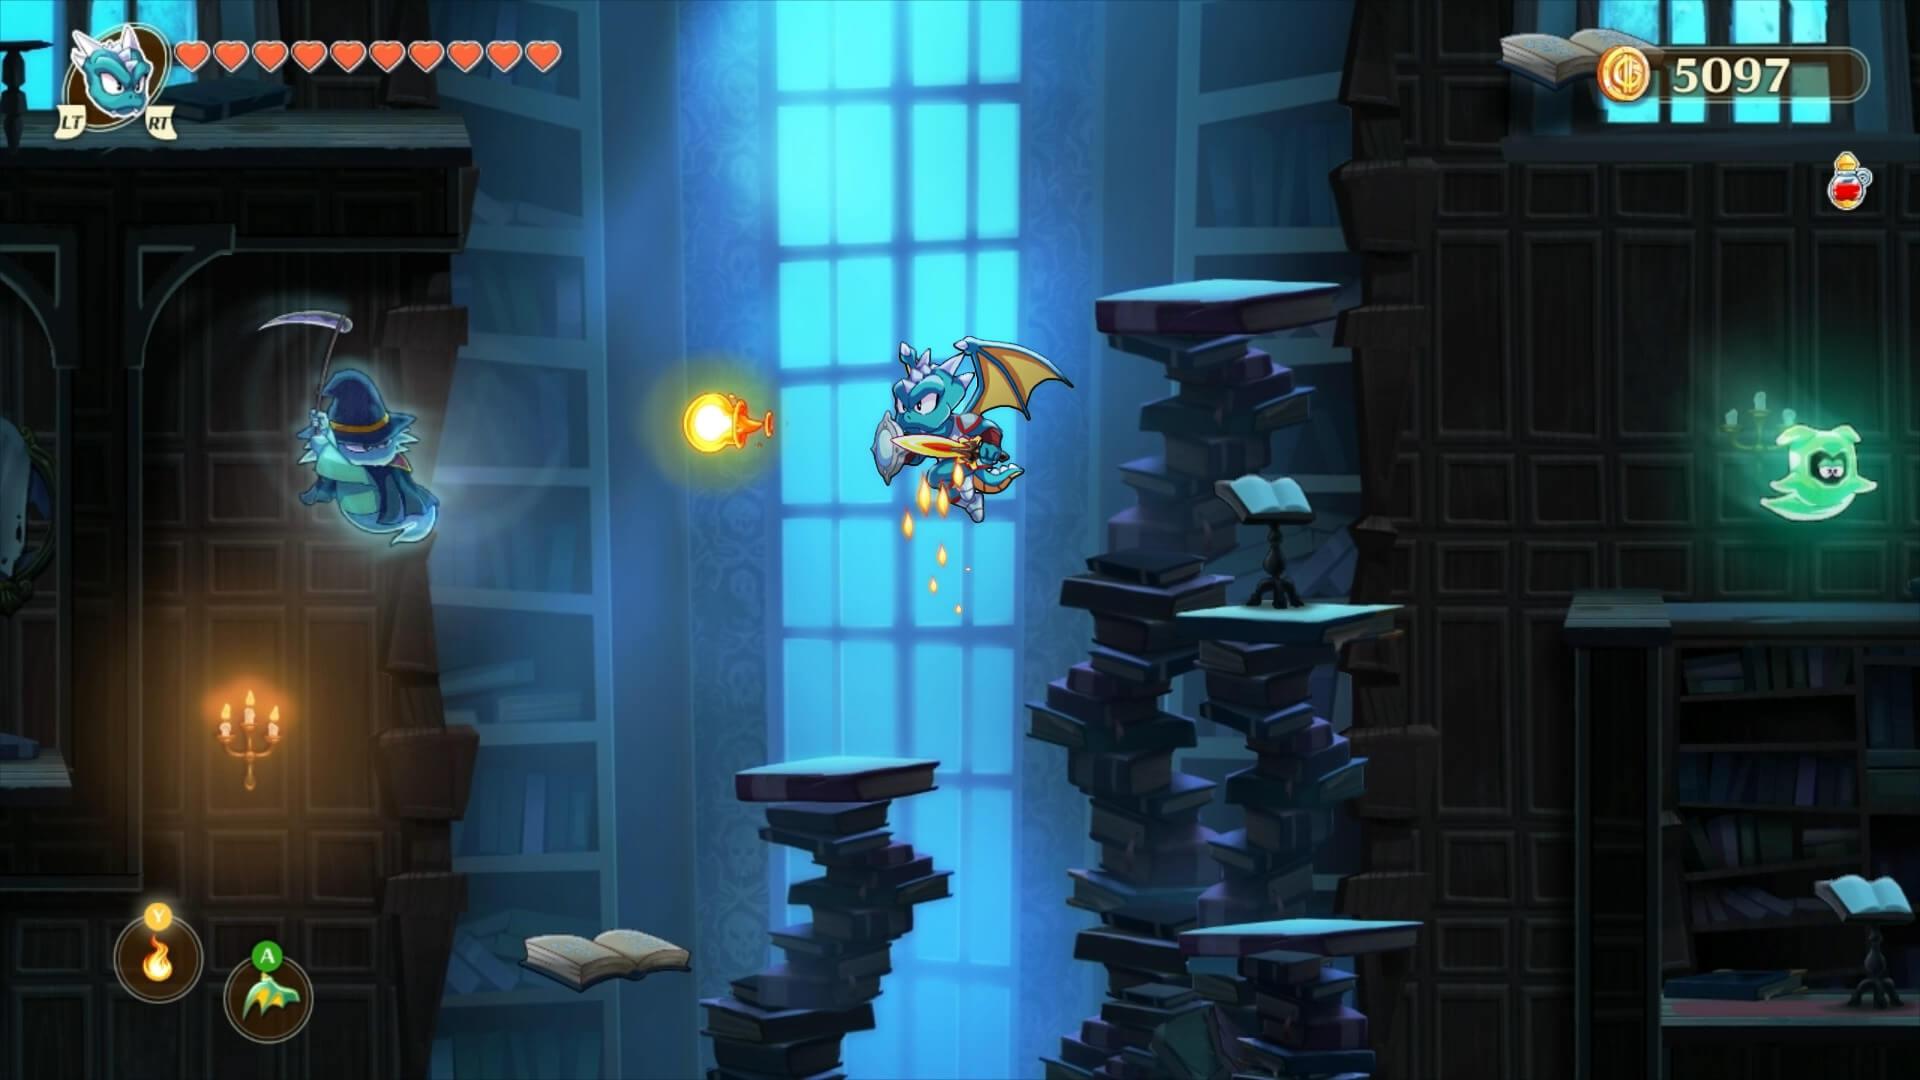 Скриншот из игры Monster Boy and the Cursed Kingdom